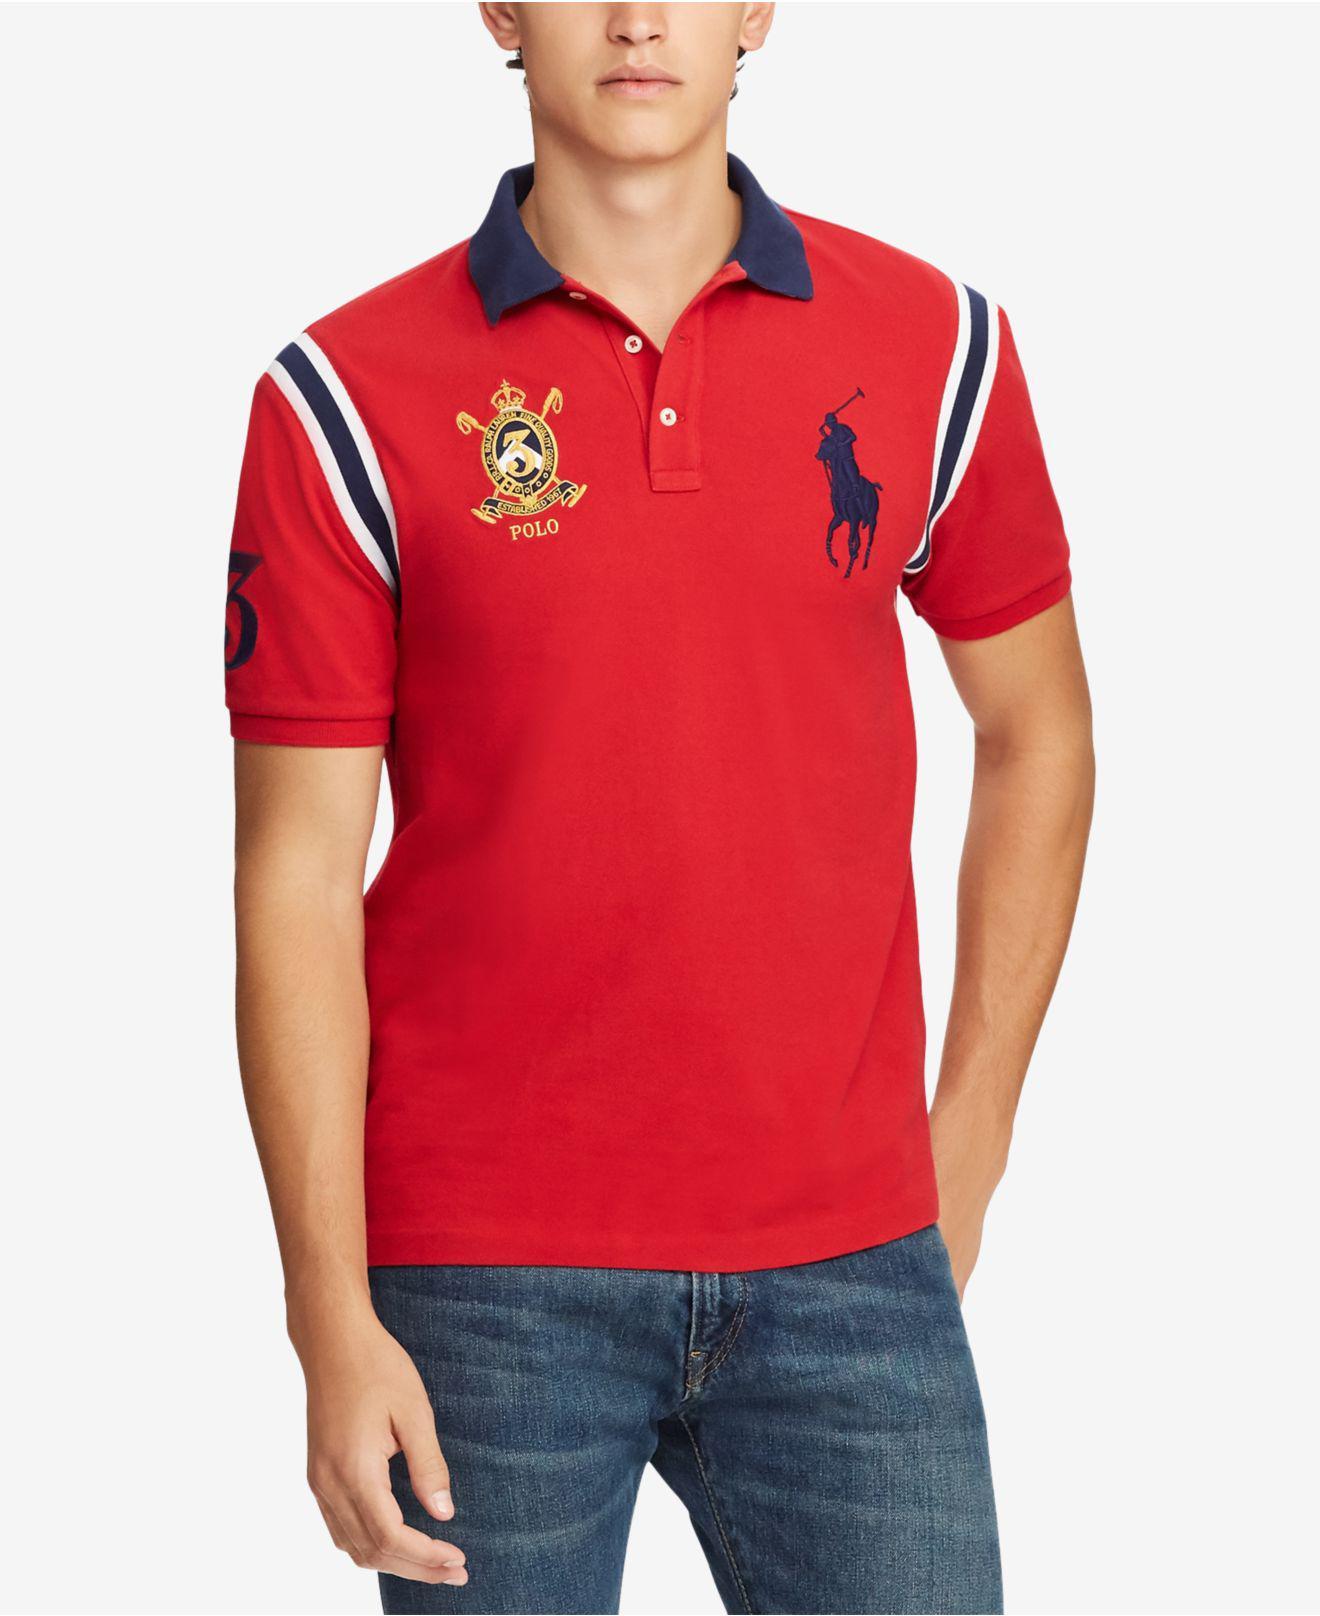 f28aeb9b Lyst - Polo Ralph Lauren Big Pony Vintage Crest Short-sleeve Polo ...